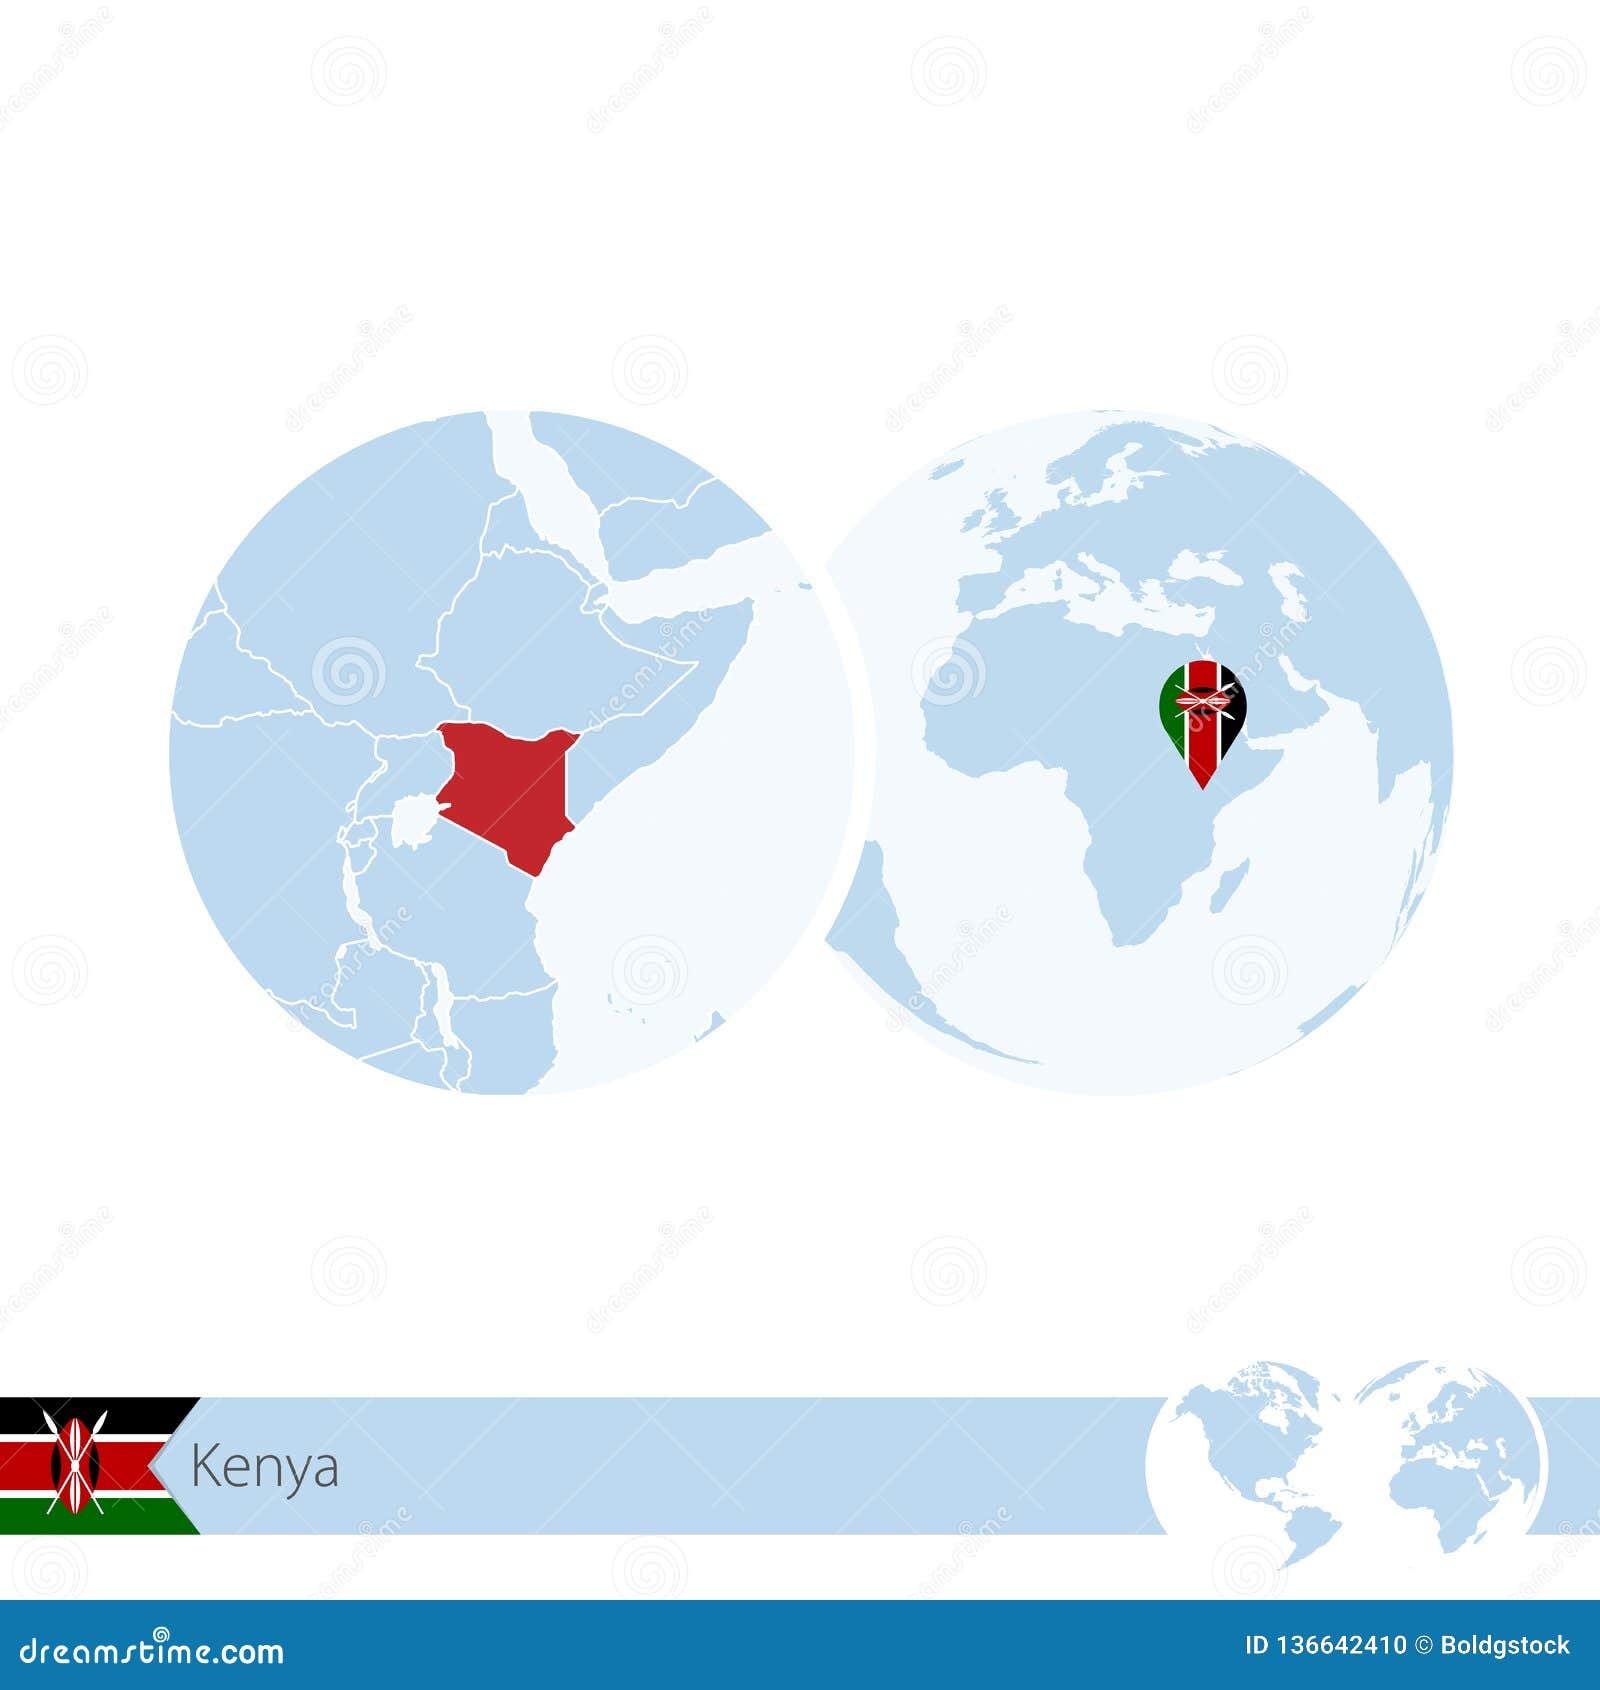 Kenya On World Globe With Flag And Regional Map Of Kenya Stock